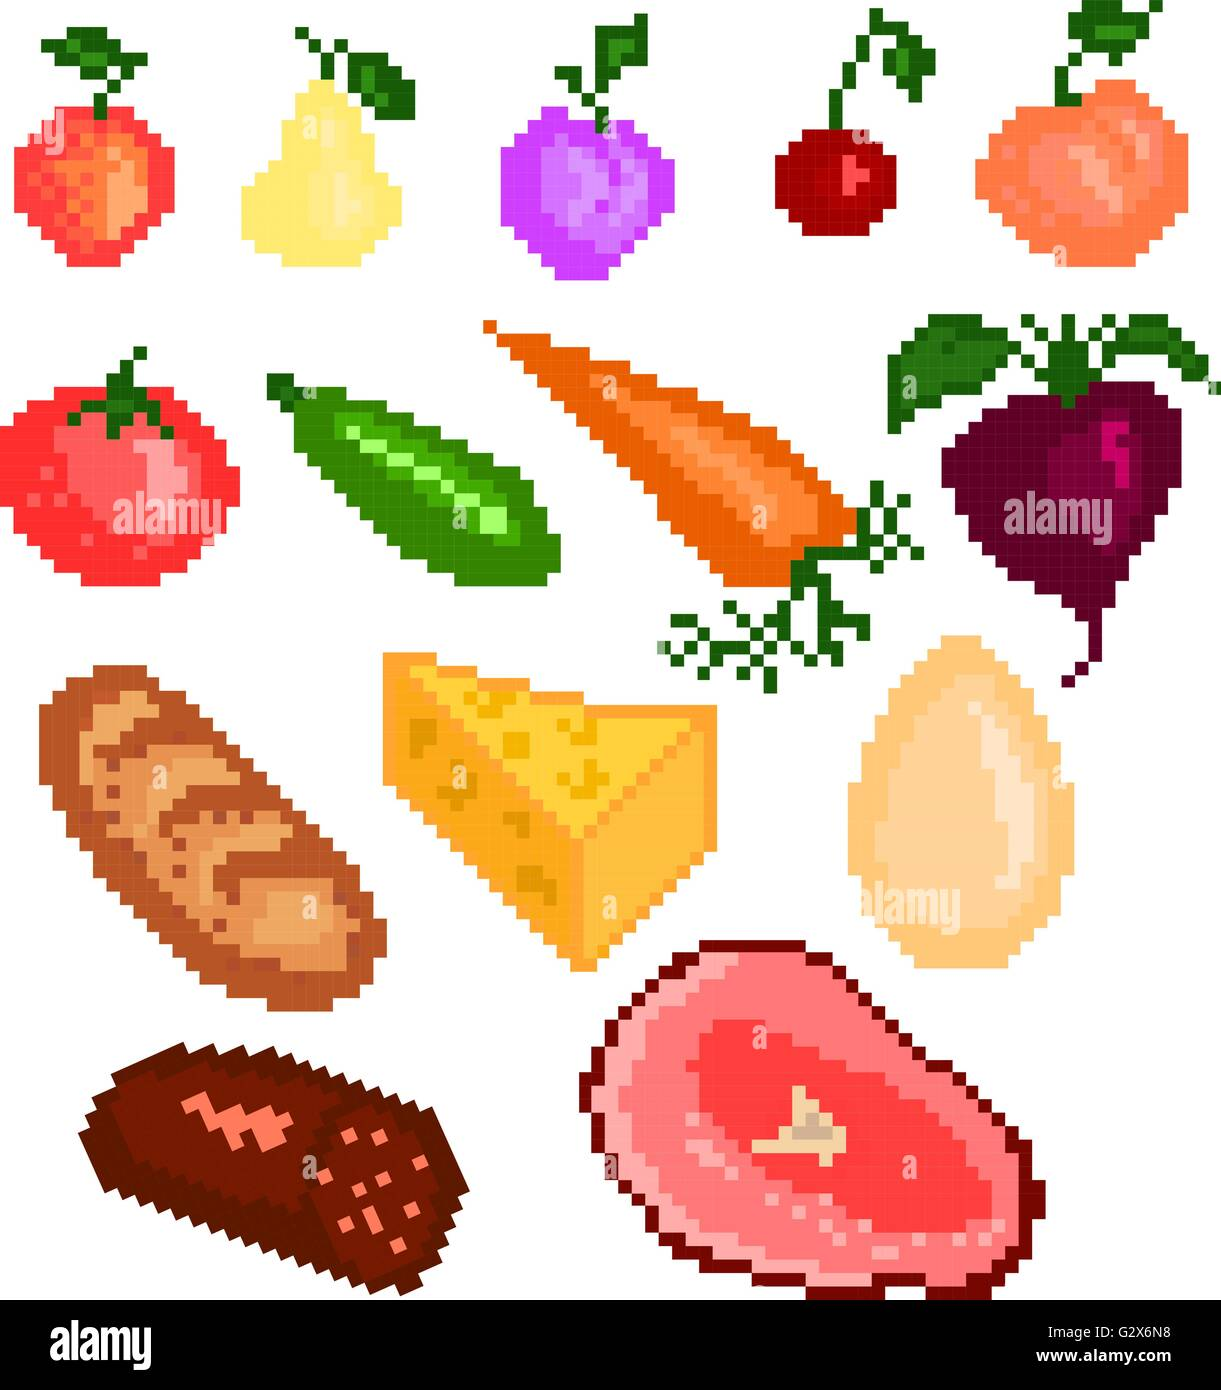 Nourriture Pixelart Vecteurs Et Illustration Image